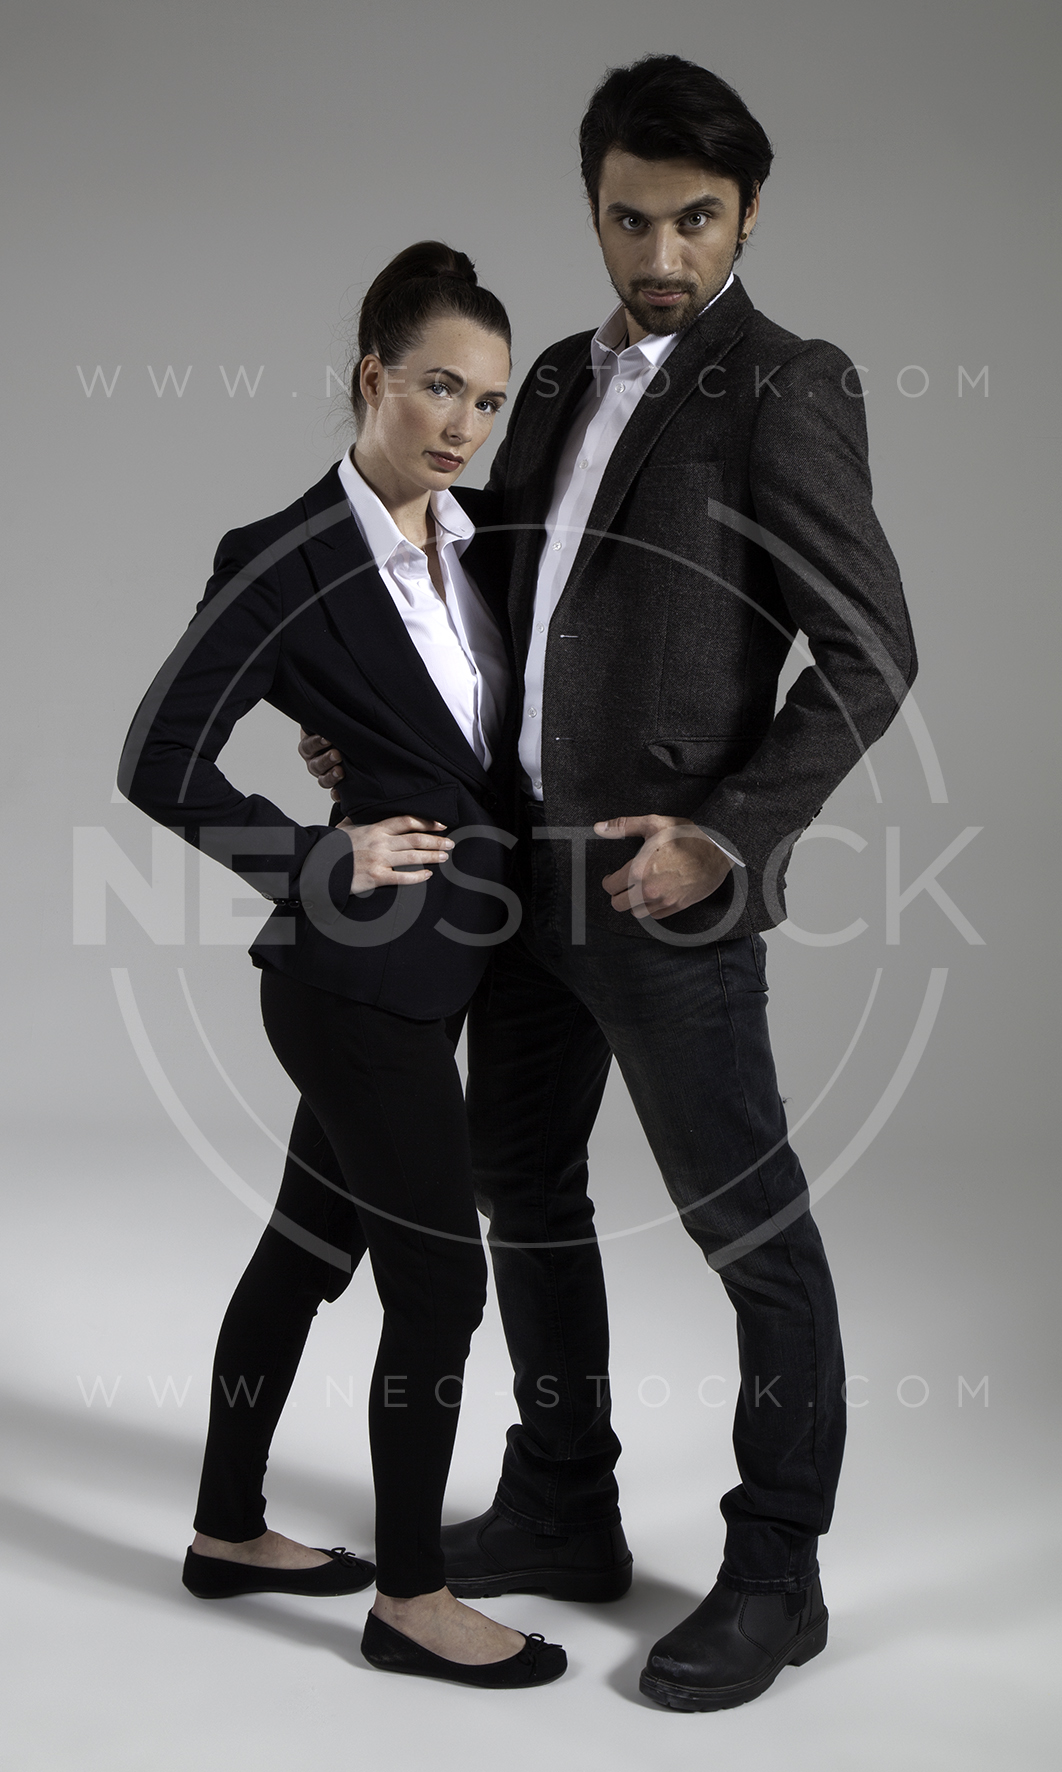 NeoStock - Cop Drama Duo - Stock Photography III